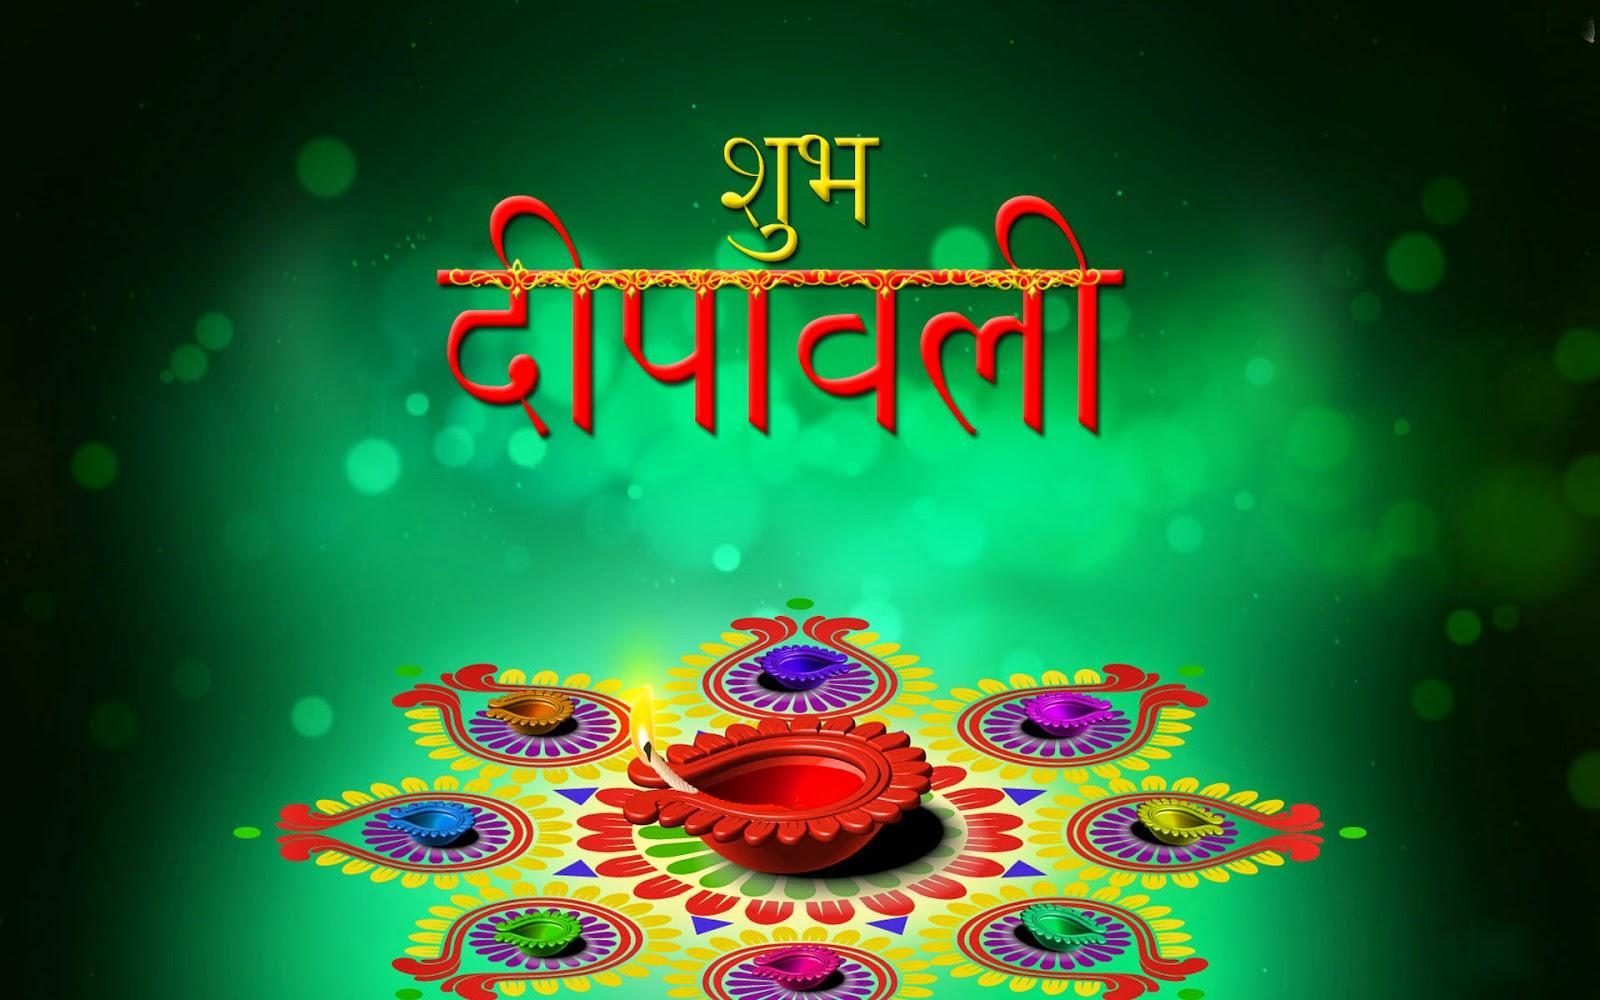 Happy Diwali Hd Wallpapers Hd 2014 Happy Diwali 2015 Images Sms